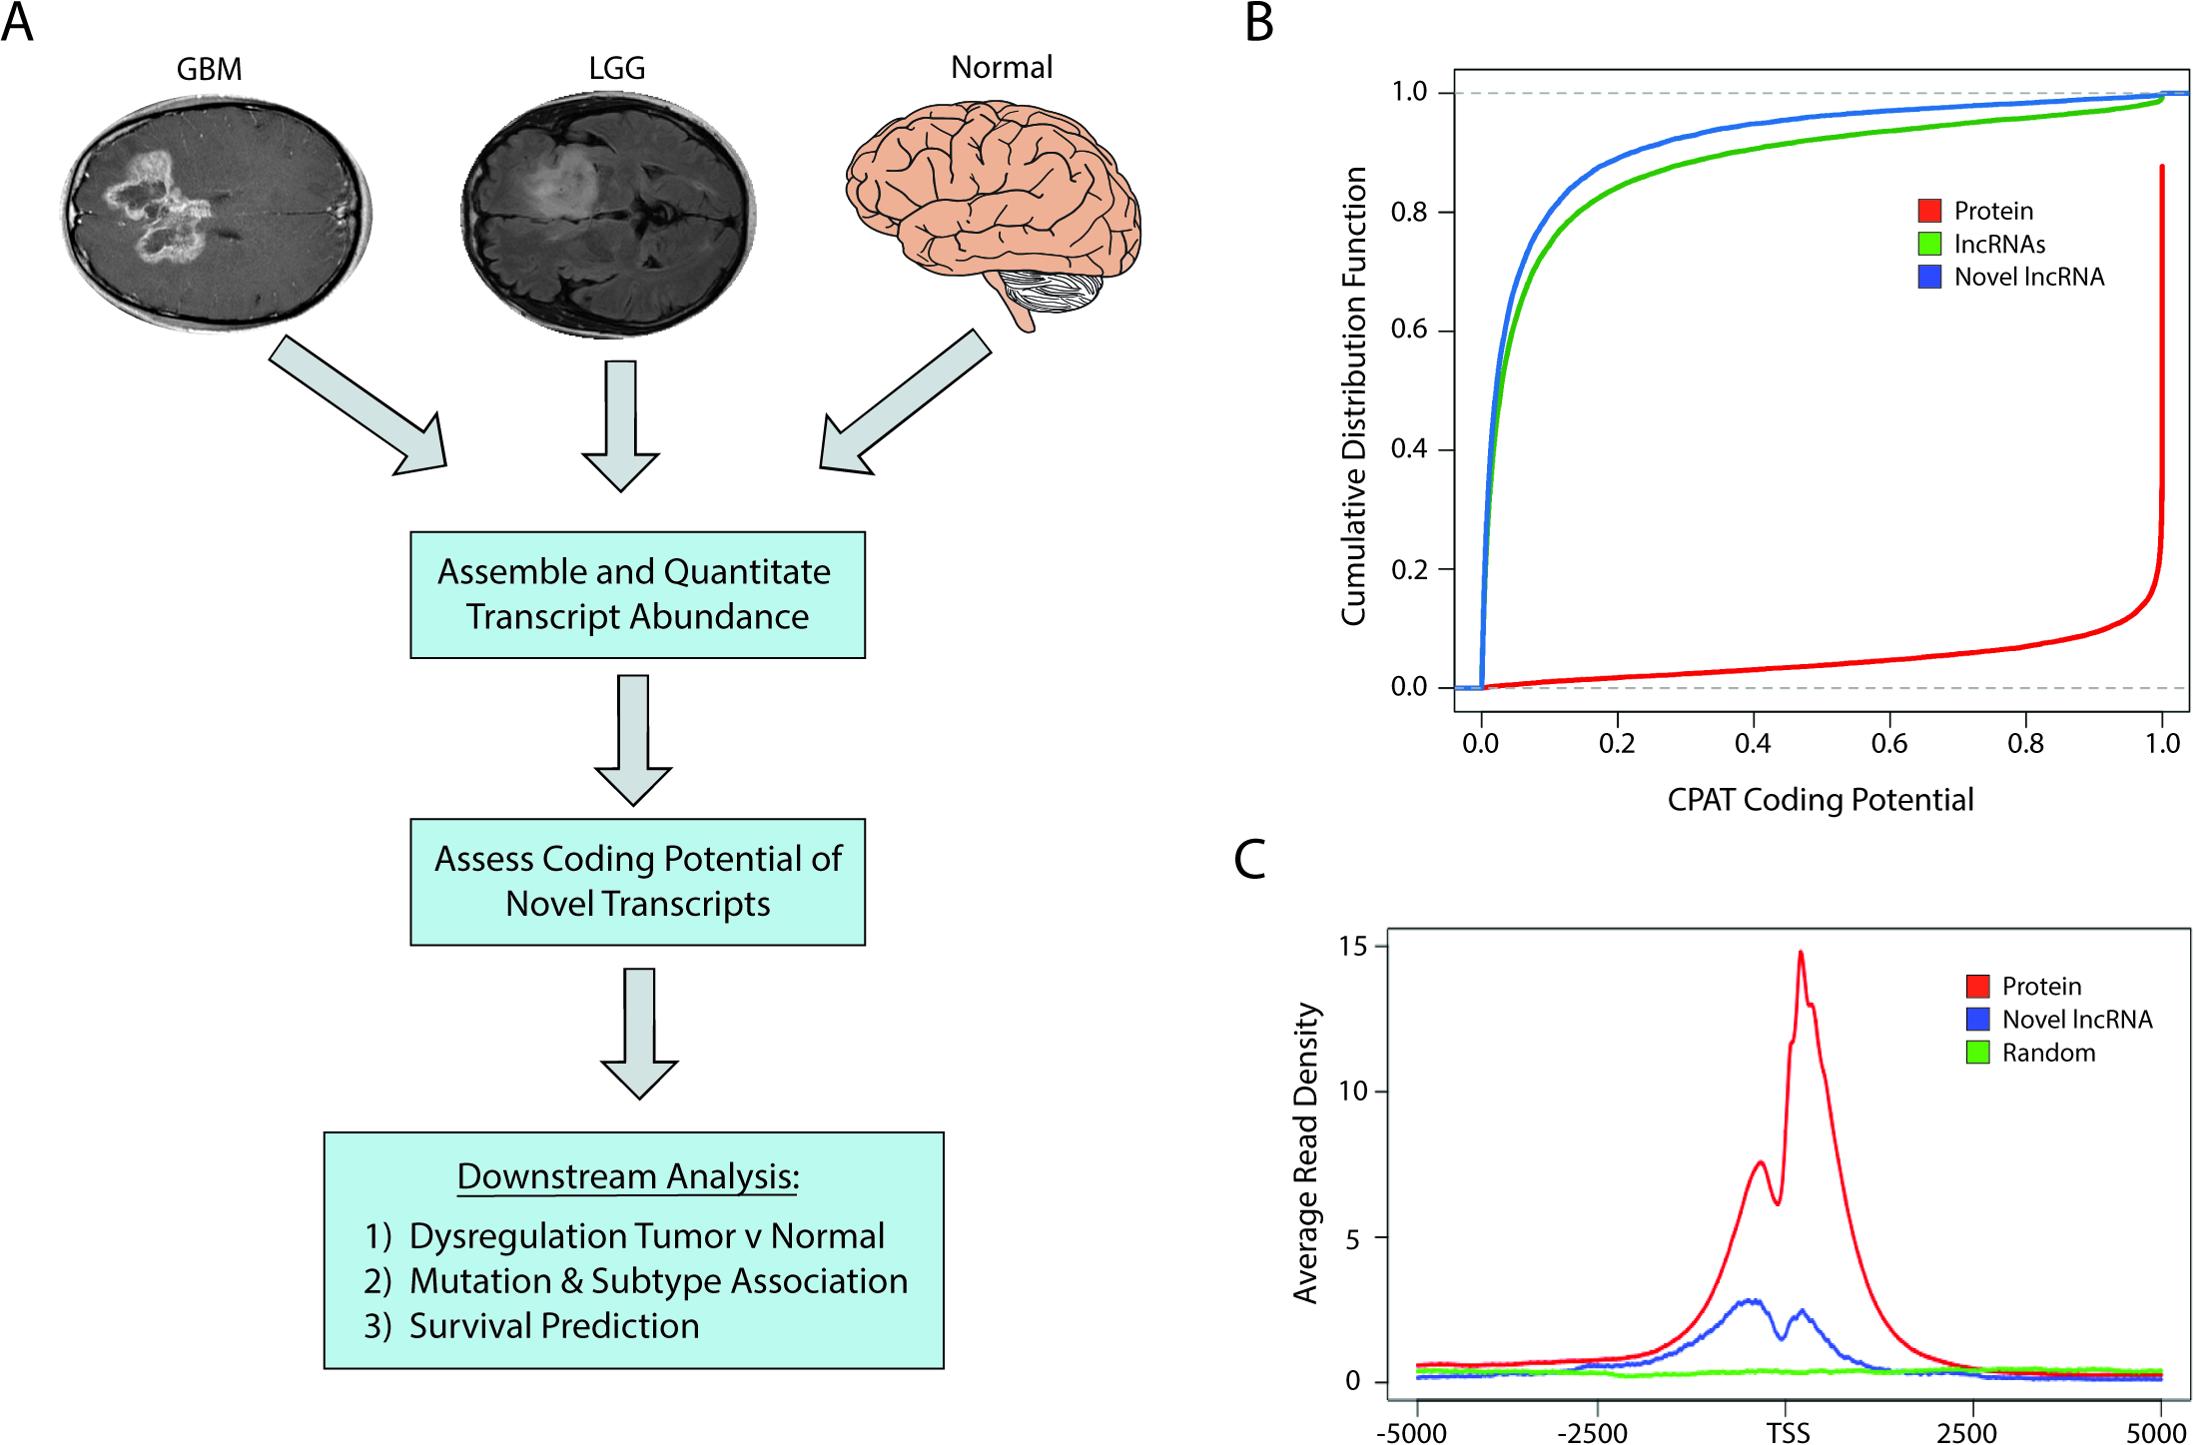 Identification of novel lncRNAs in glial tumors and normal brain RNA-seq samples.